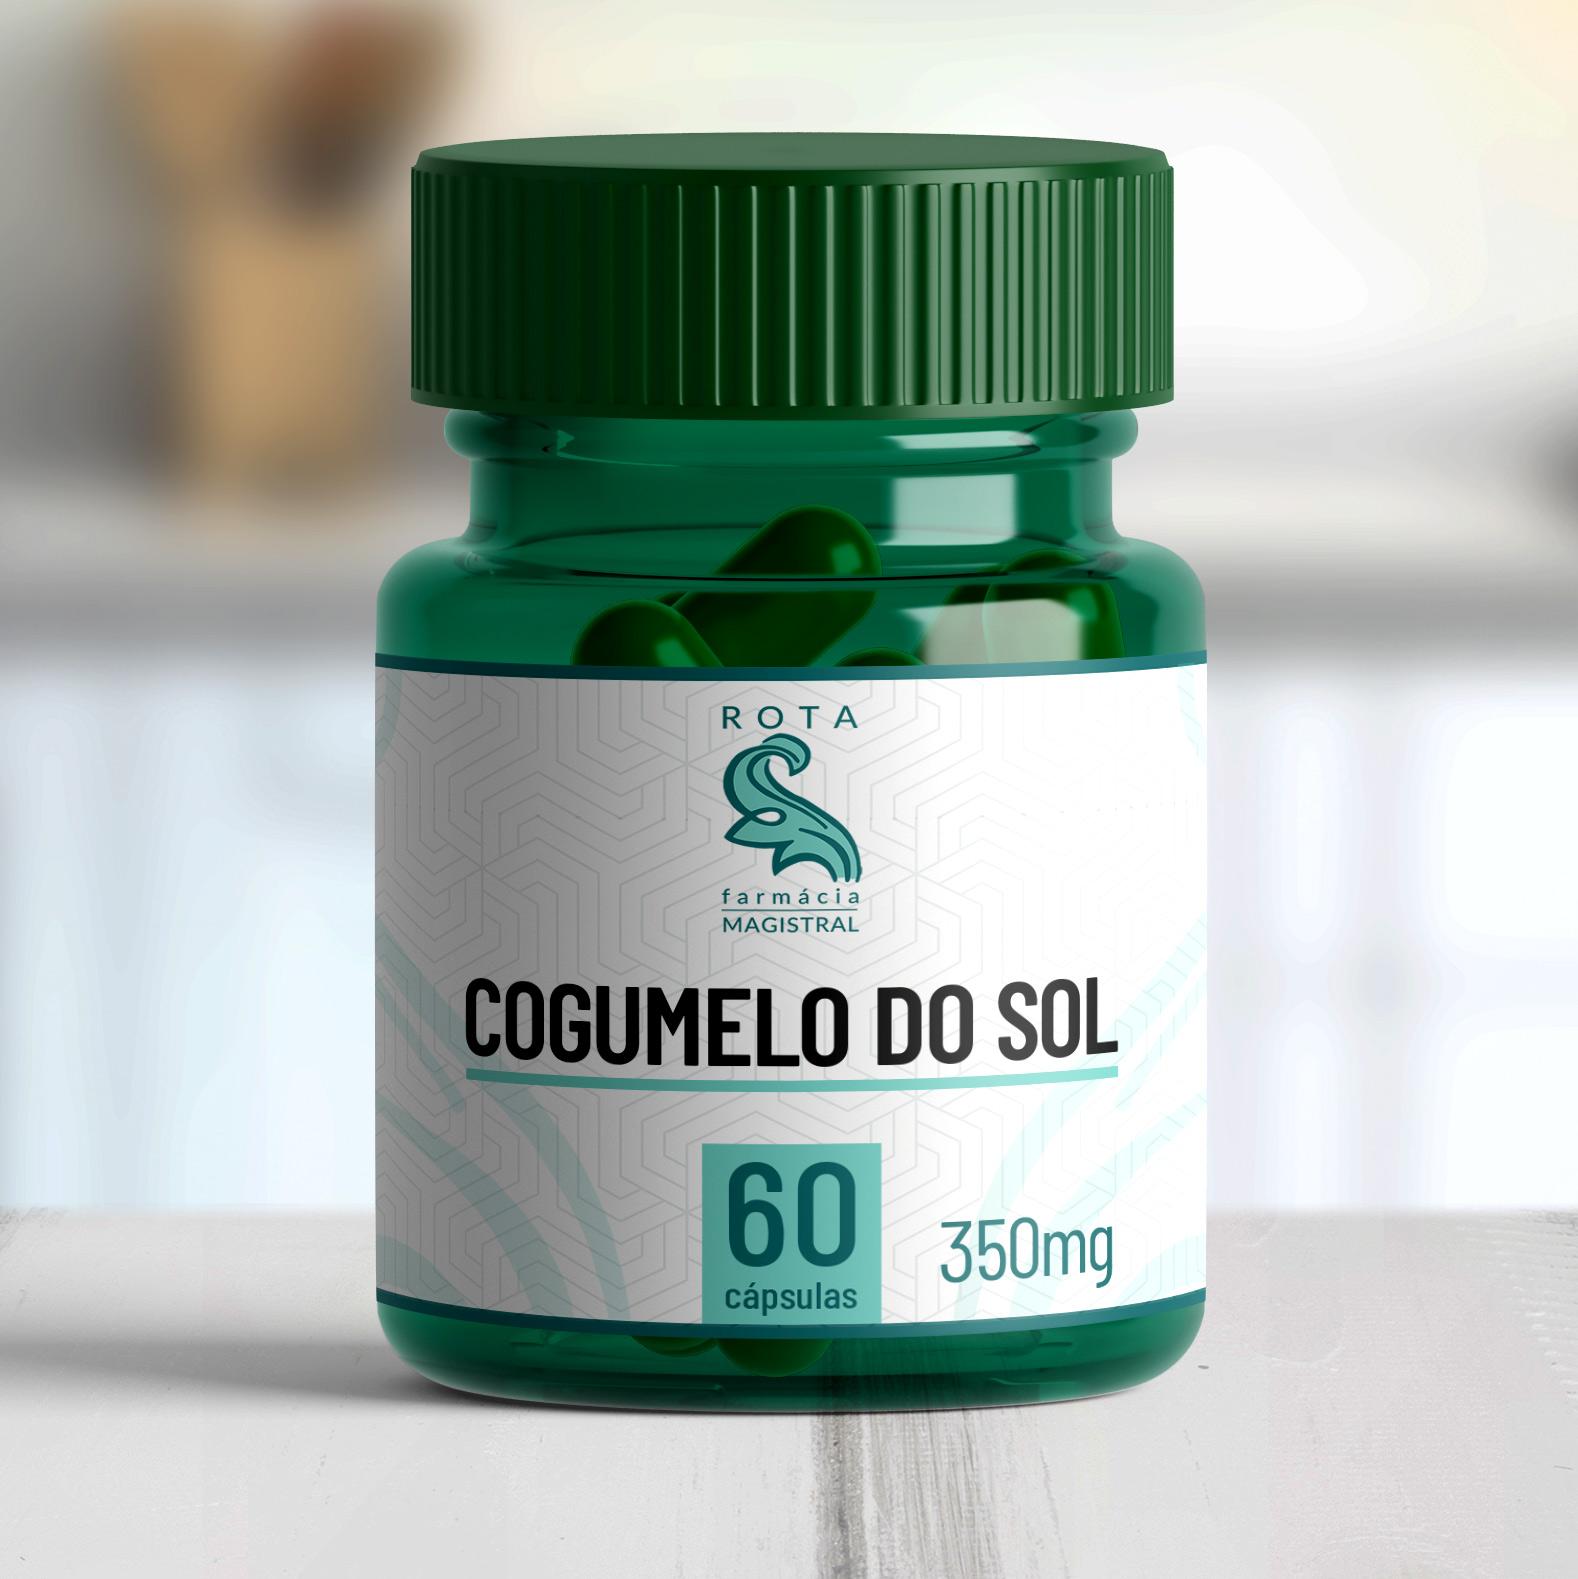 Cogumelo do Sol 350mg 60 cápsulas